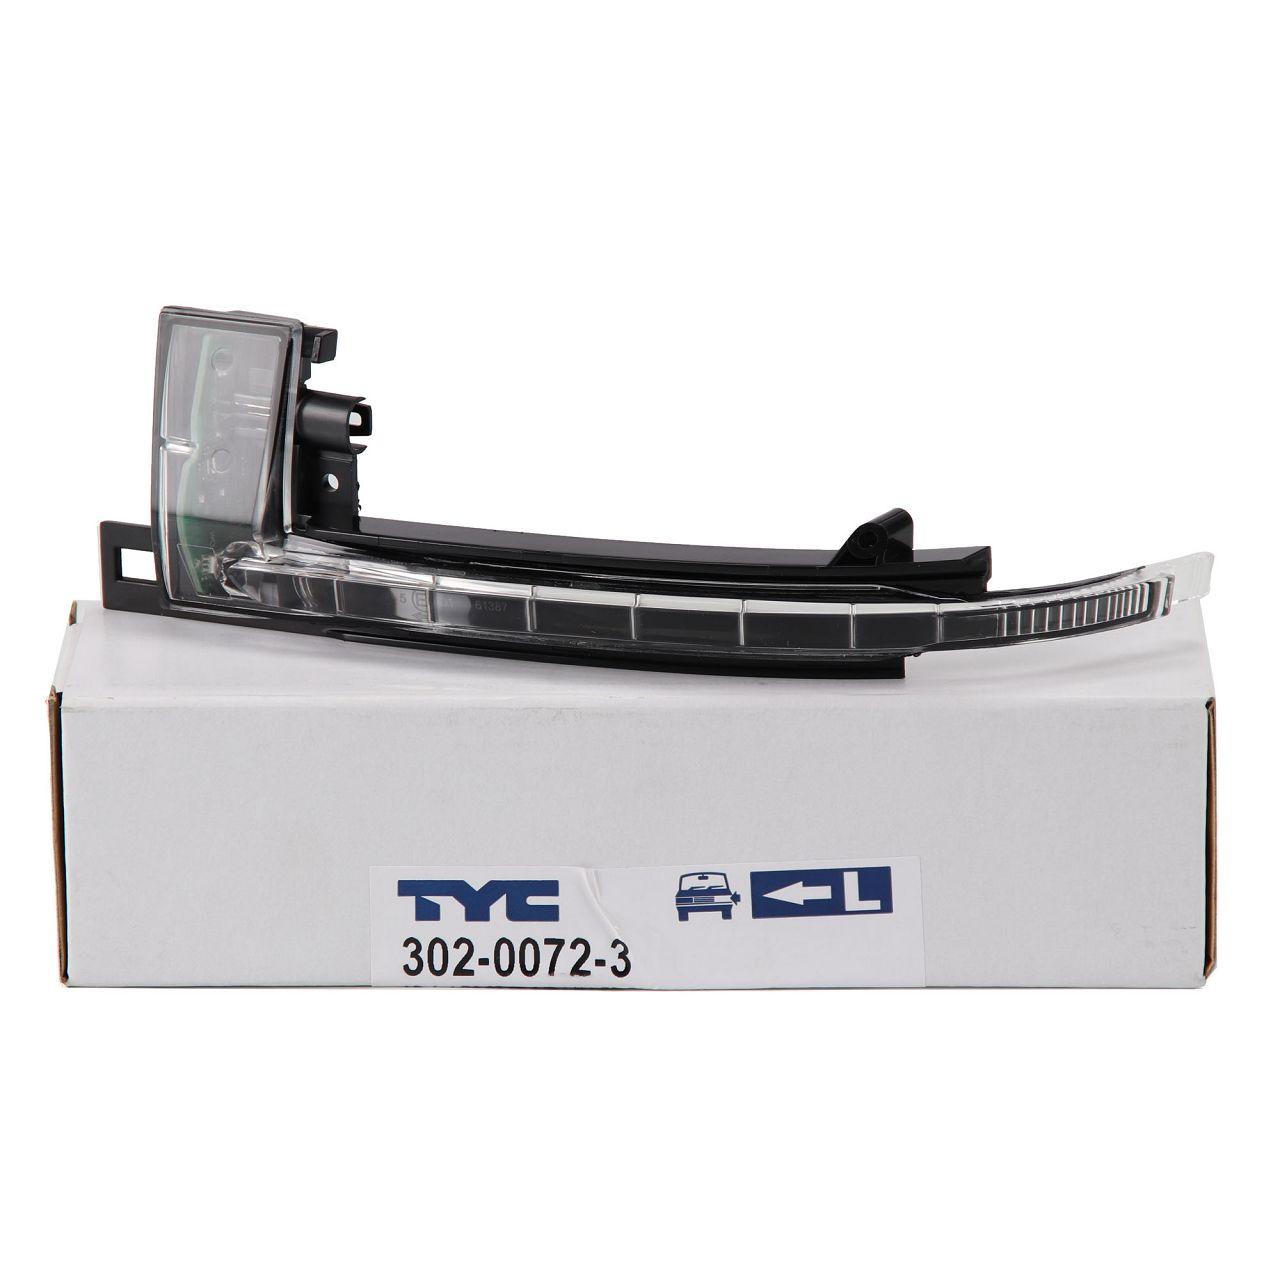 TYC Blinkleuchte Außenspiegel LED für AUDI A3 8P A4 B8 A5 8T A6 C6 Q3 links